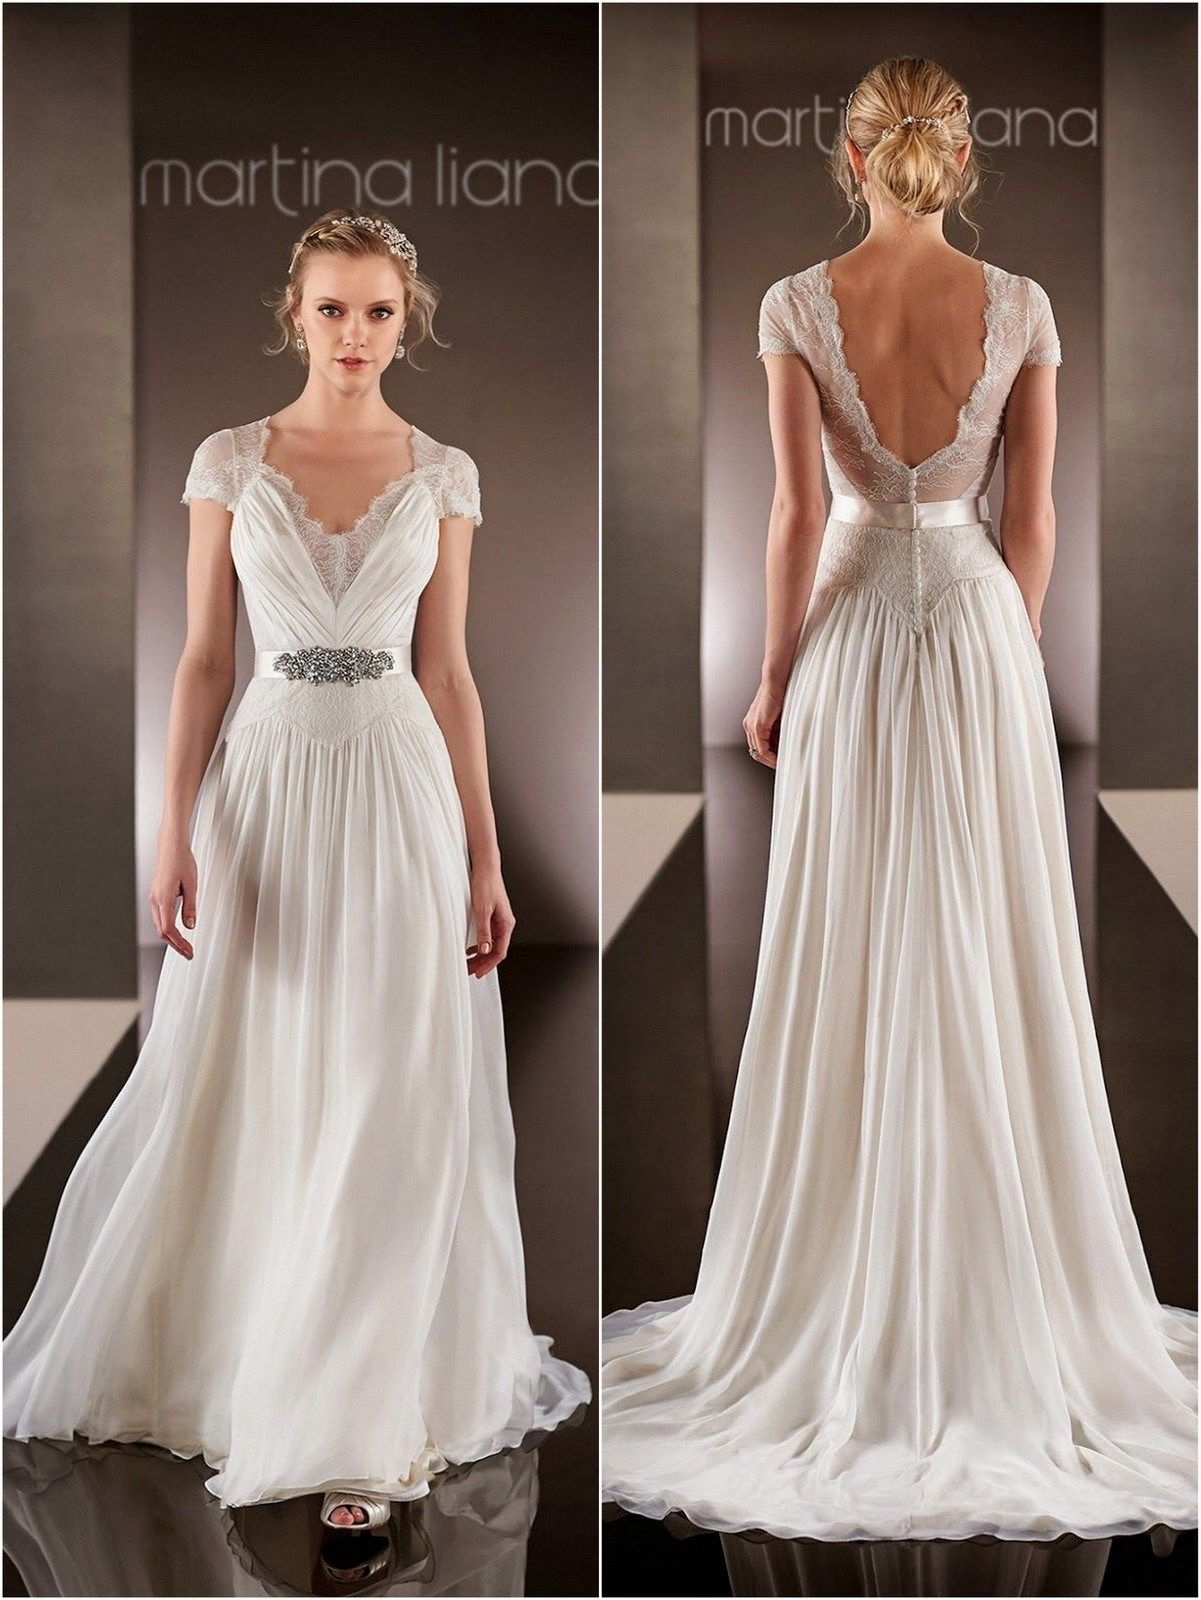 Martina Liana Wedding Dresses 2015 Wedding Dresses Knotsvilla Wedding Ideas Canada Wedding Blog Short Bridal Dress Short Sleeve Wedding Dress Cheap Lace Wedding Dresses